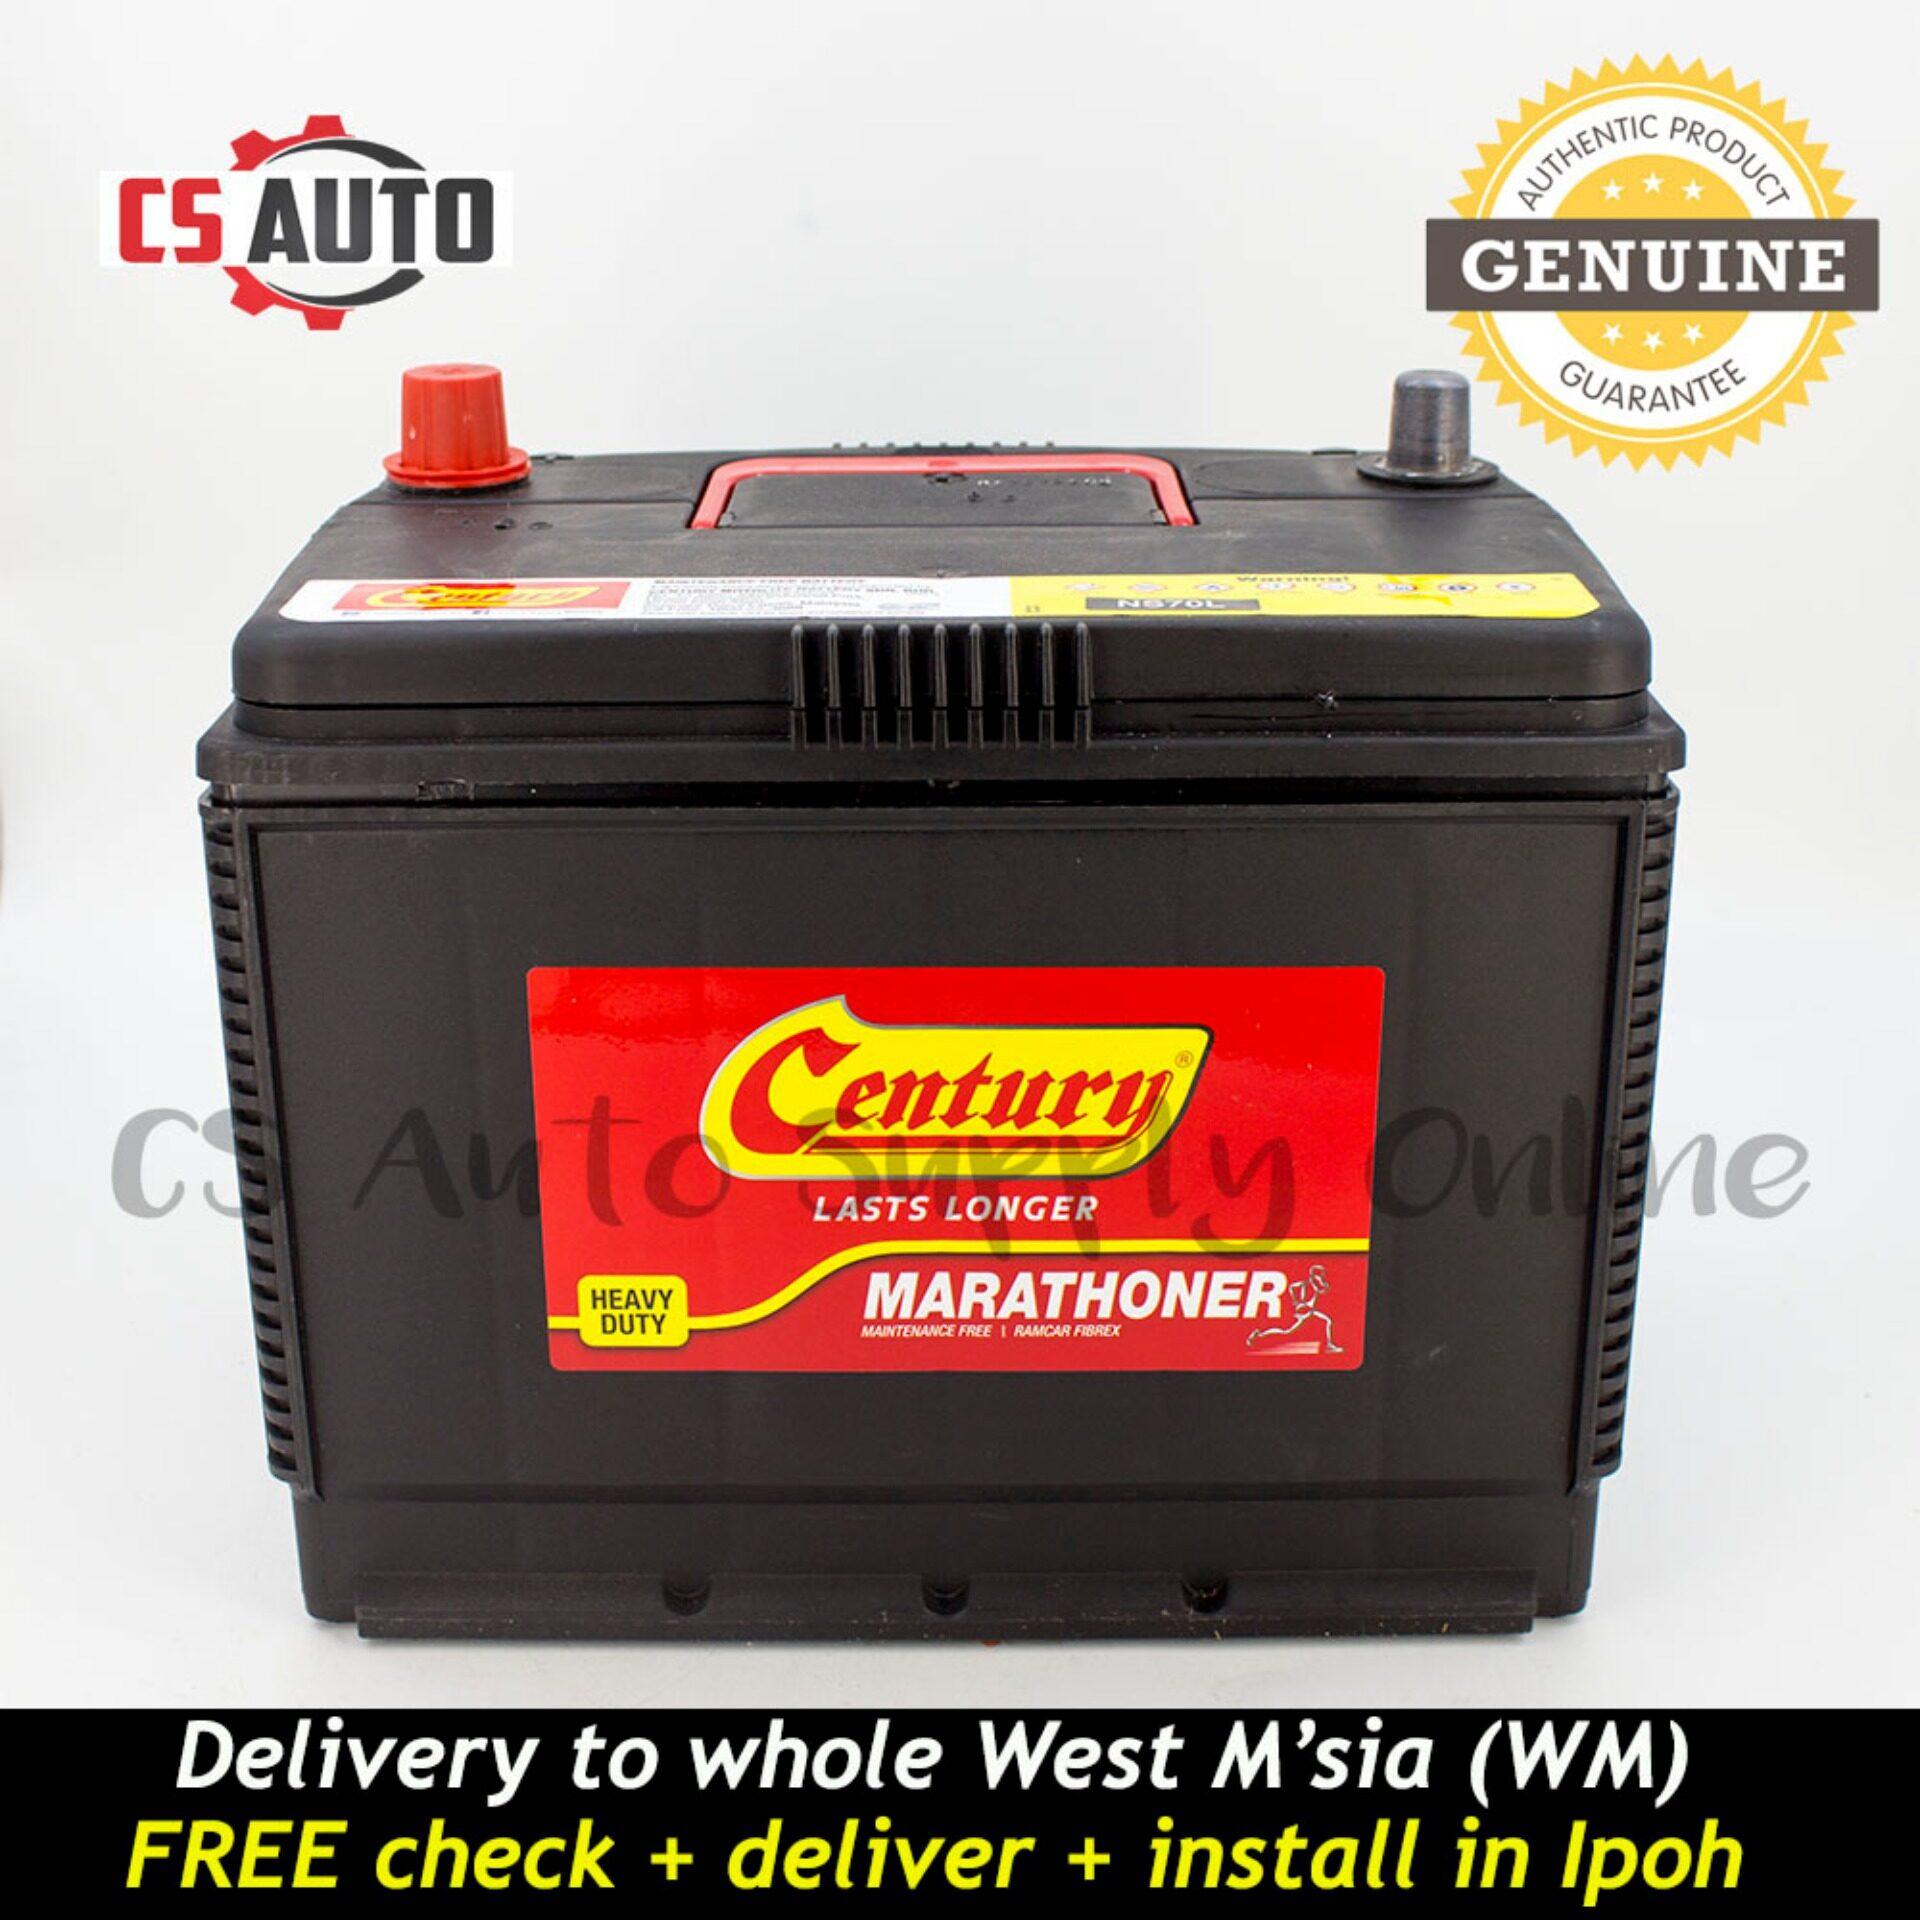 Century NS70L NS70 L Marathoner Car Battery MF for Proton Preve, Toyota Camry, Innova and Estima Ipoh (100% Original)